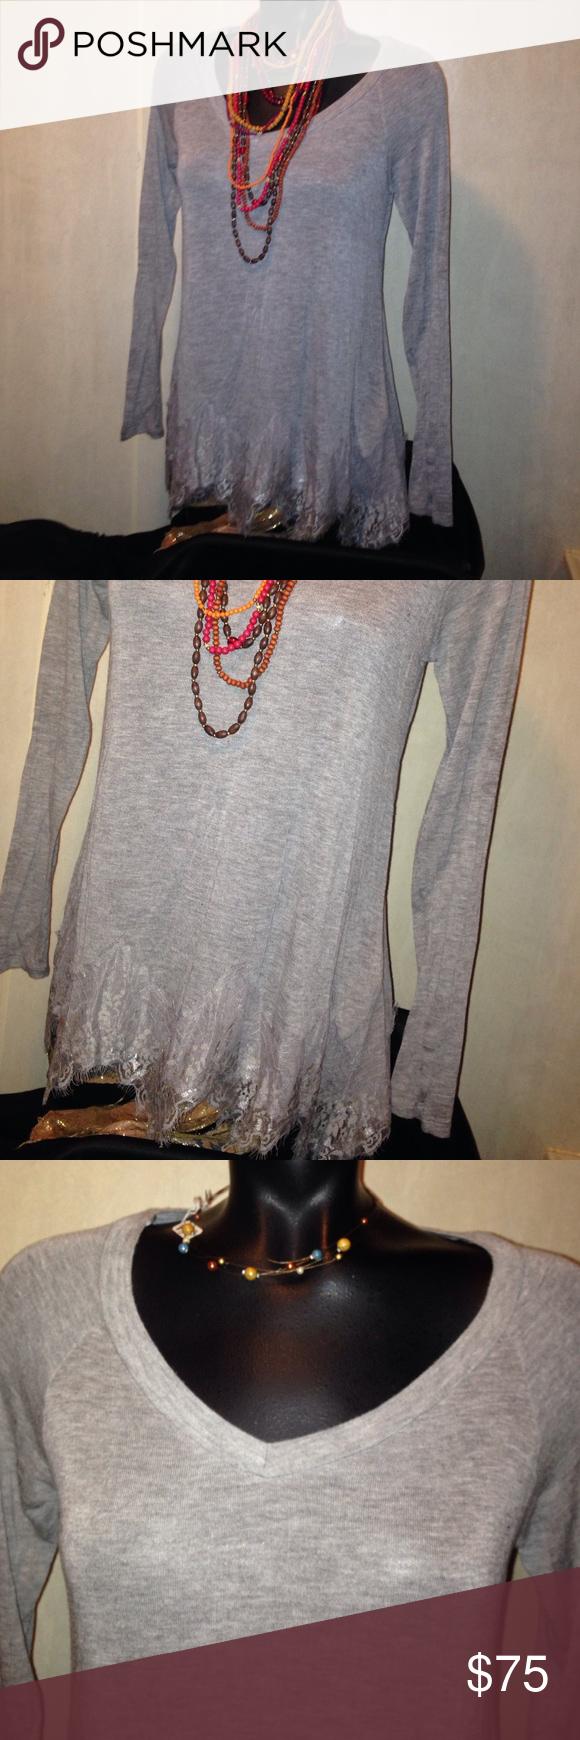 M boutique lace dress  BOHO GYPSY PEPLUM LACE BOTTOM SZ M Boutique